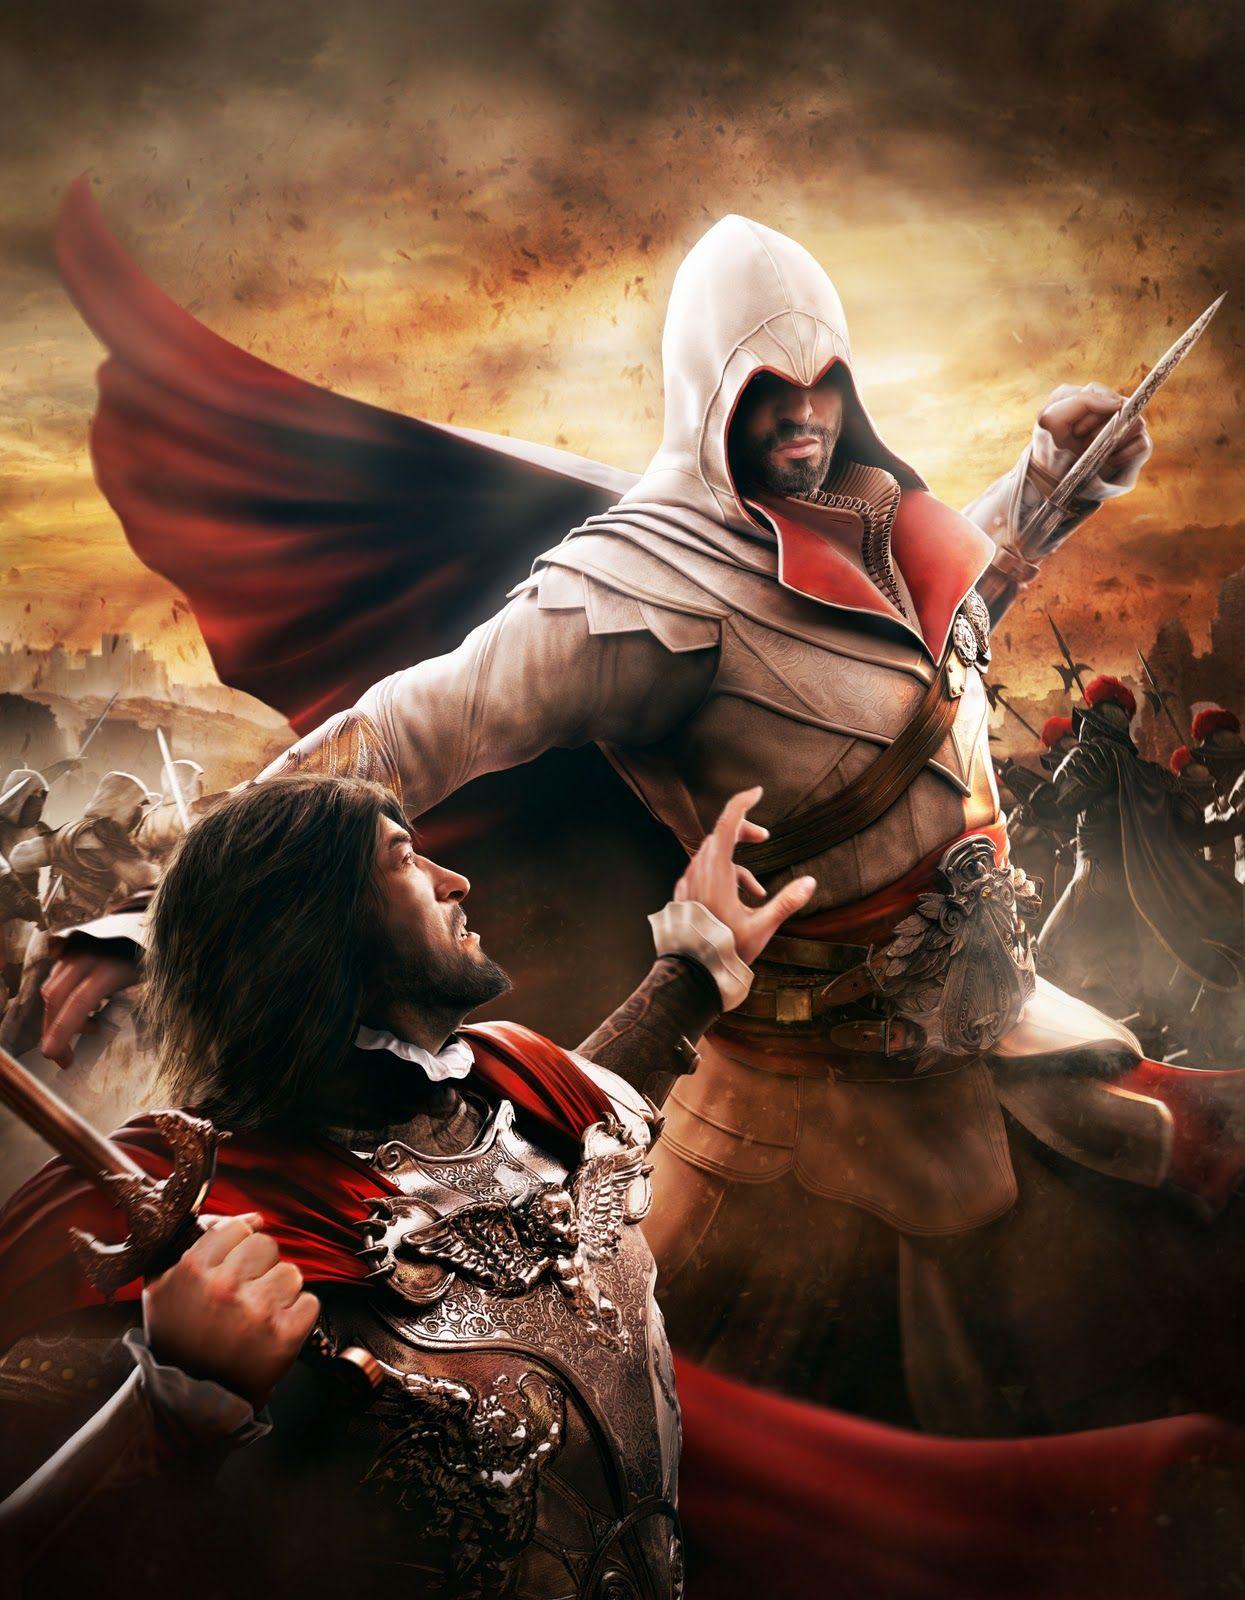 Assassin's Creed Brotherhood. Definitely one of my